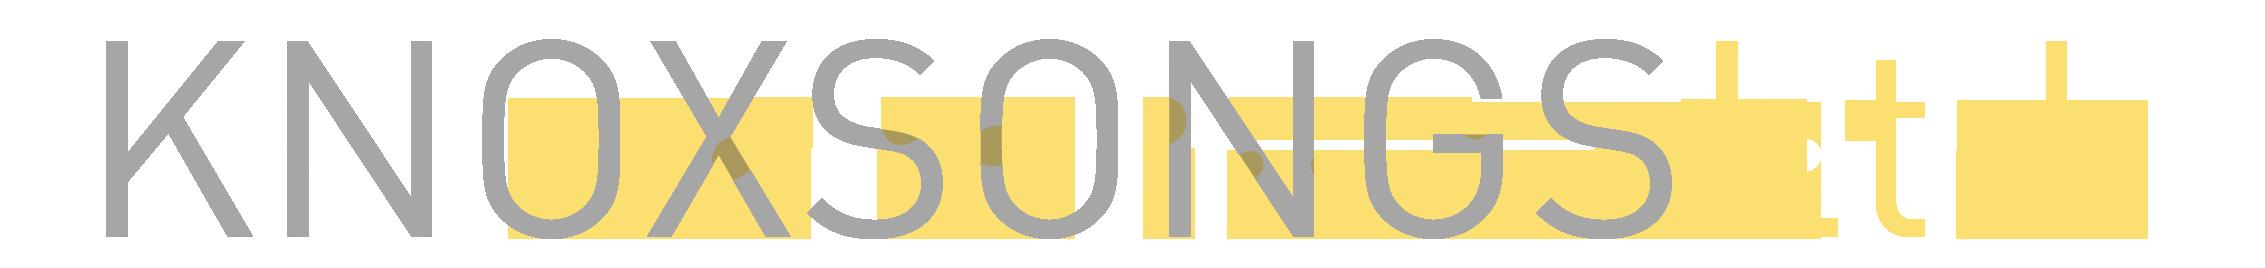 KNOXSONGS Ltd